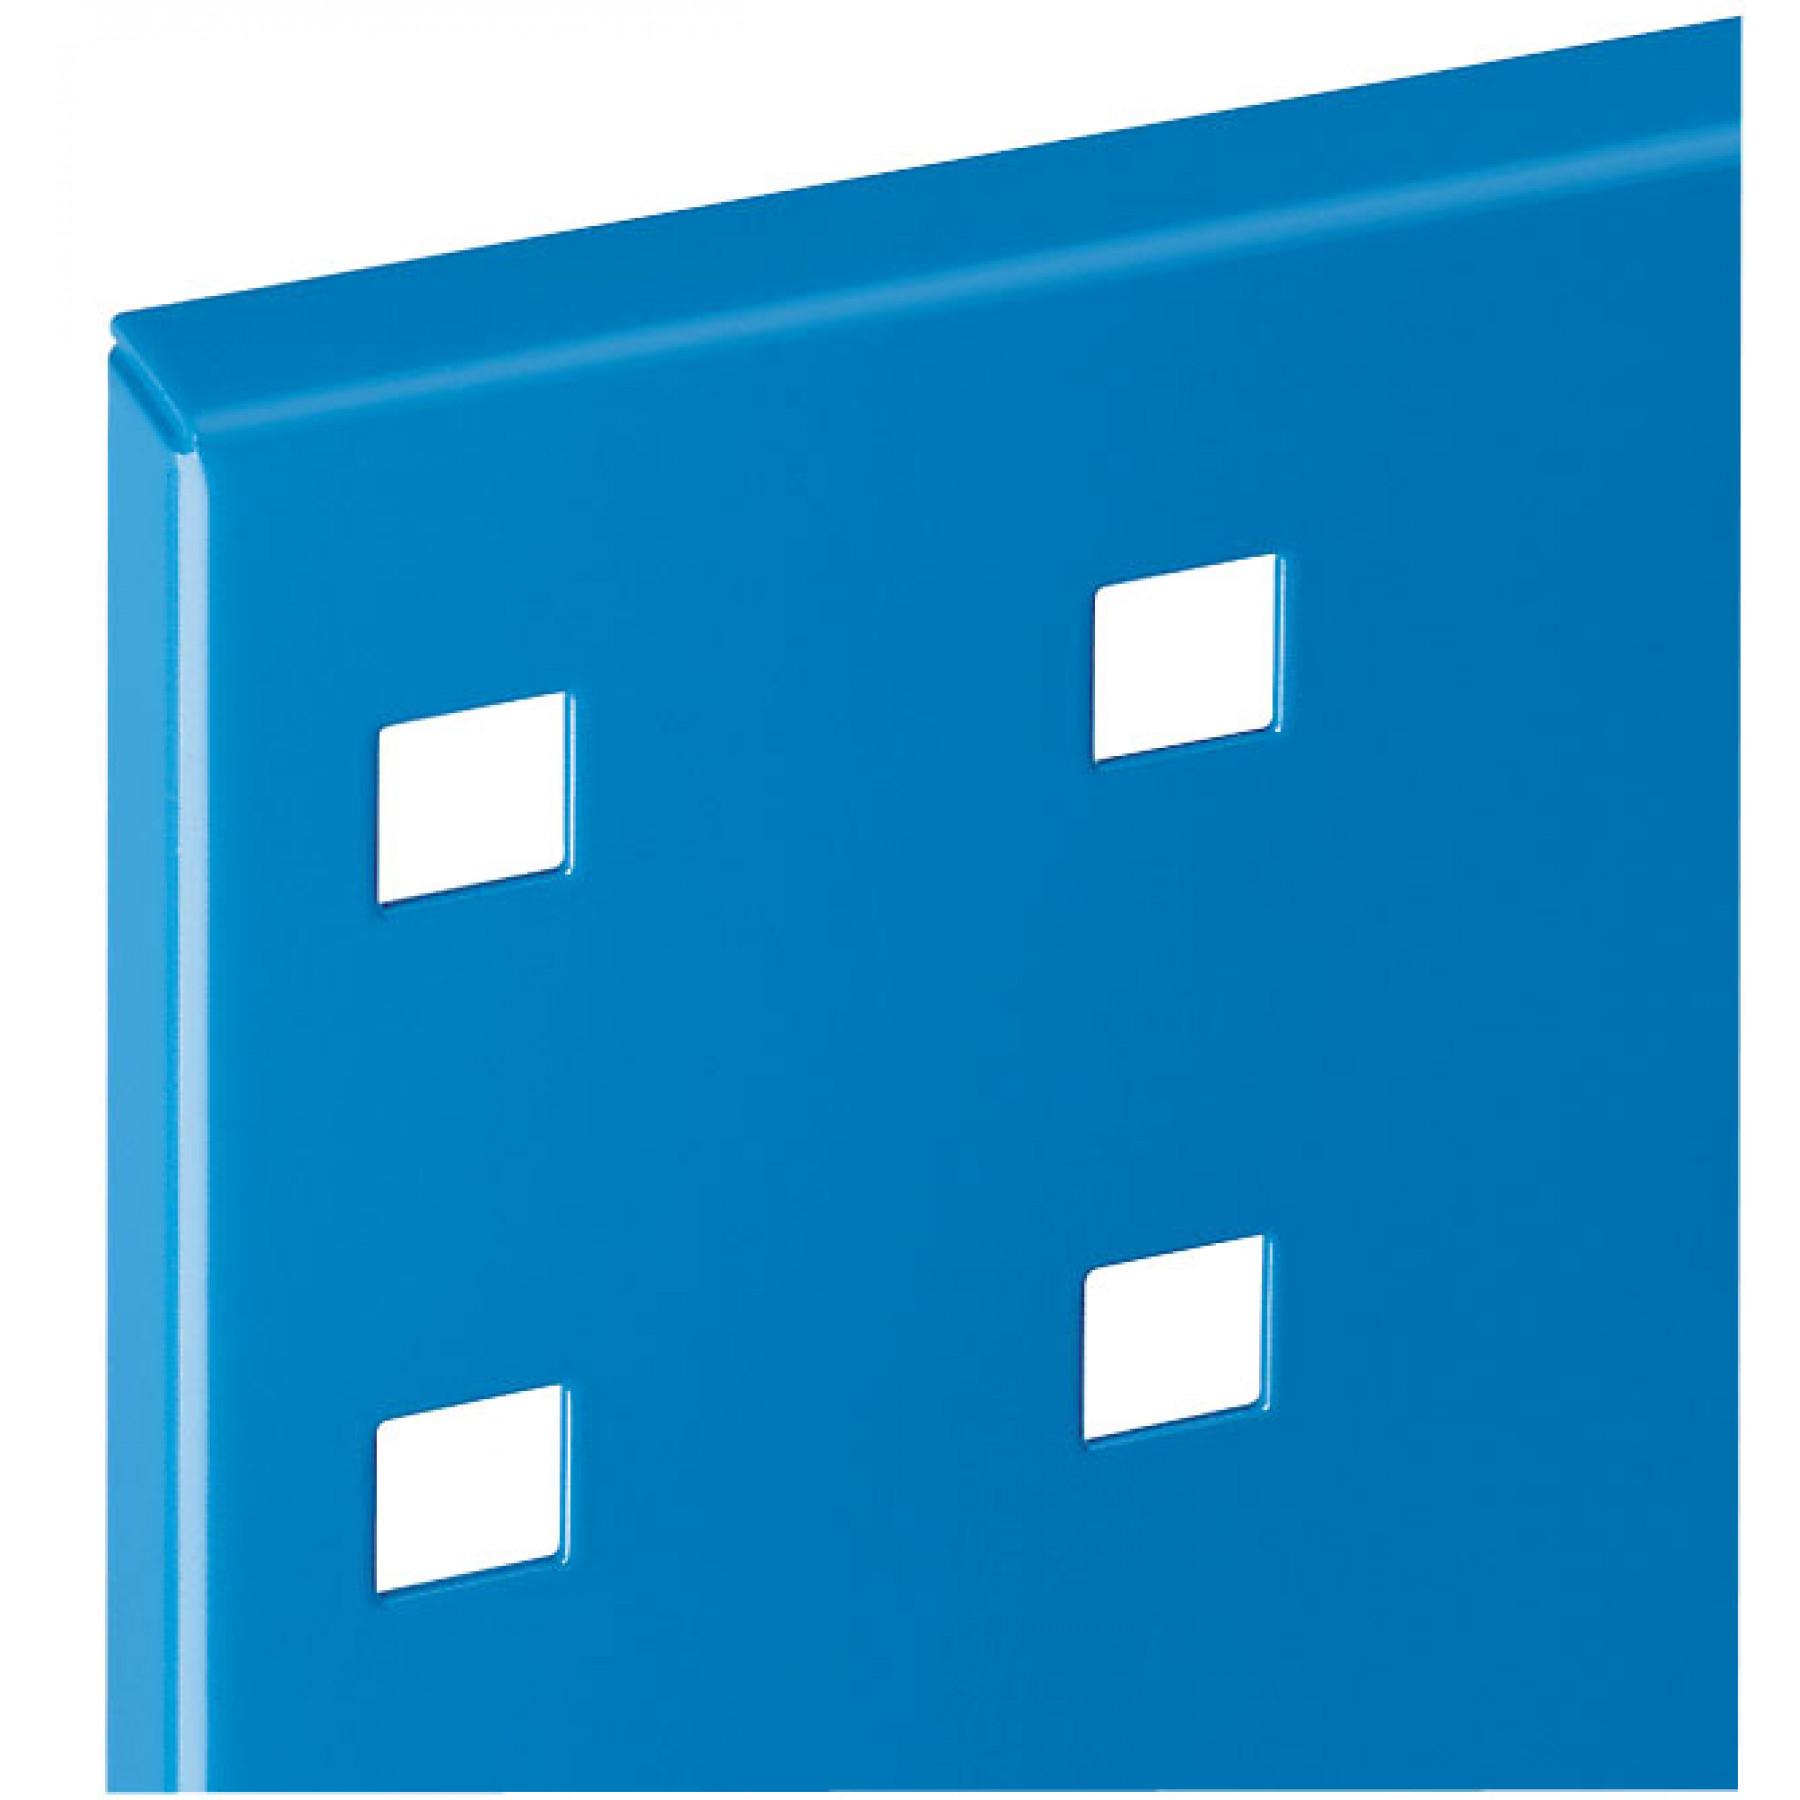 ®RasterPlan perfopaneel-1000x450 mm-RAL 5015 hemelsblauw